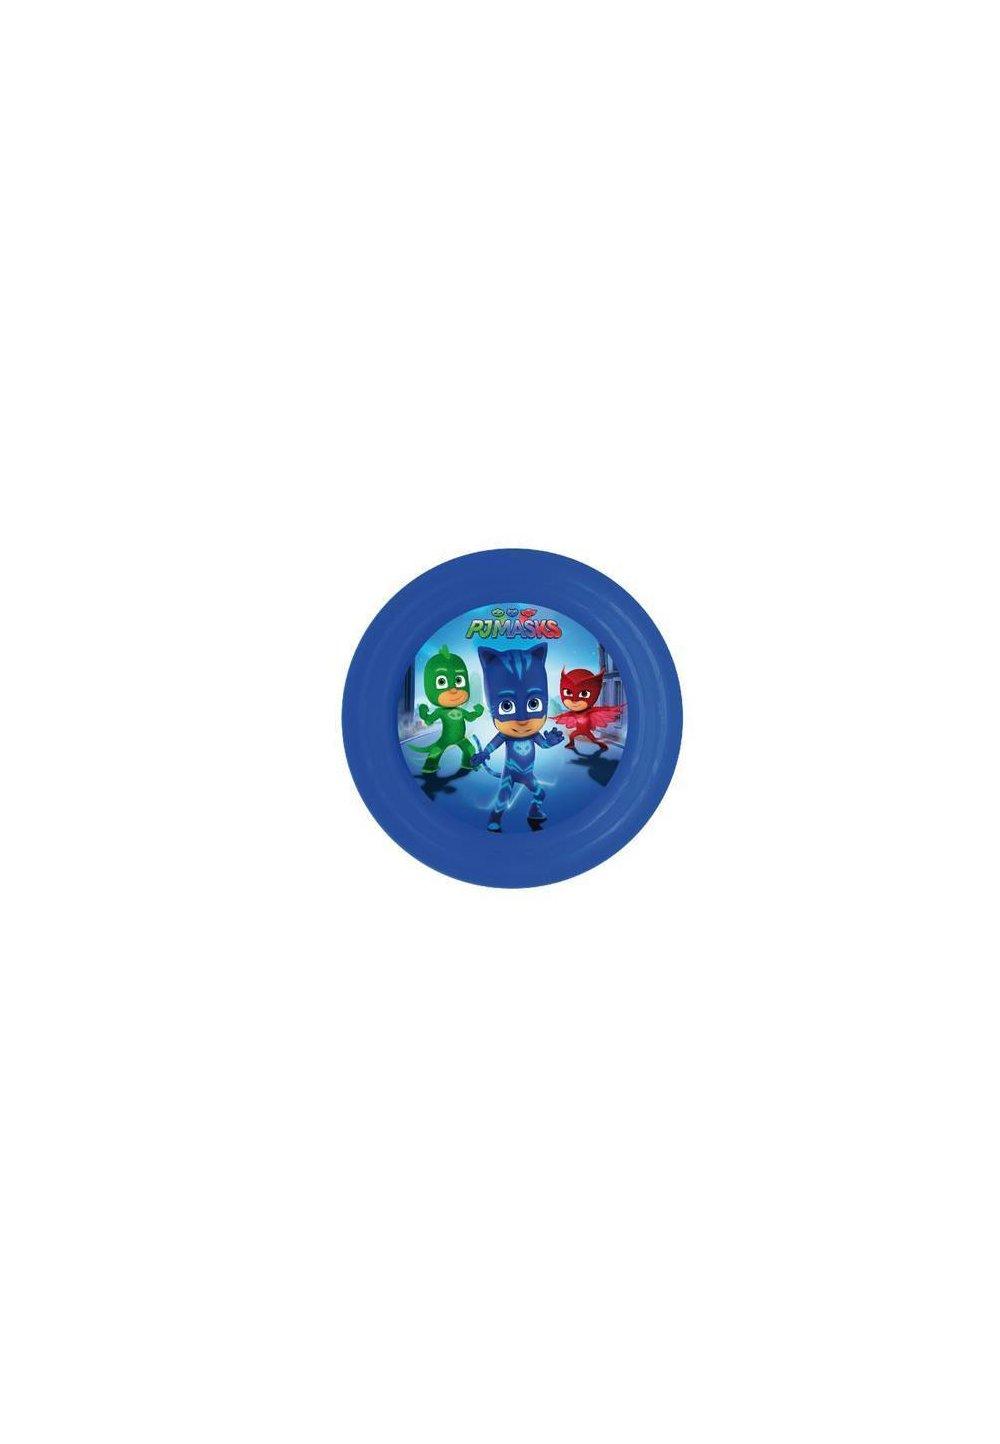 Farfurie plastic, 3D, Eroii in pijama, albastra imagine